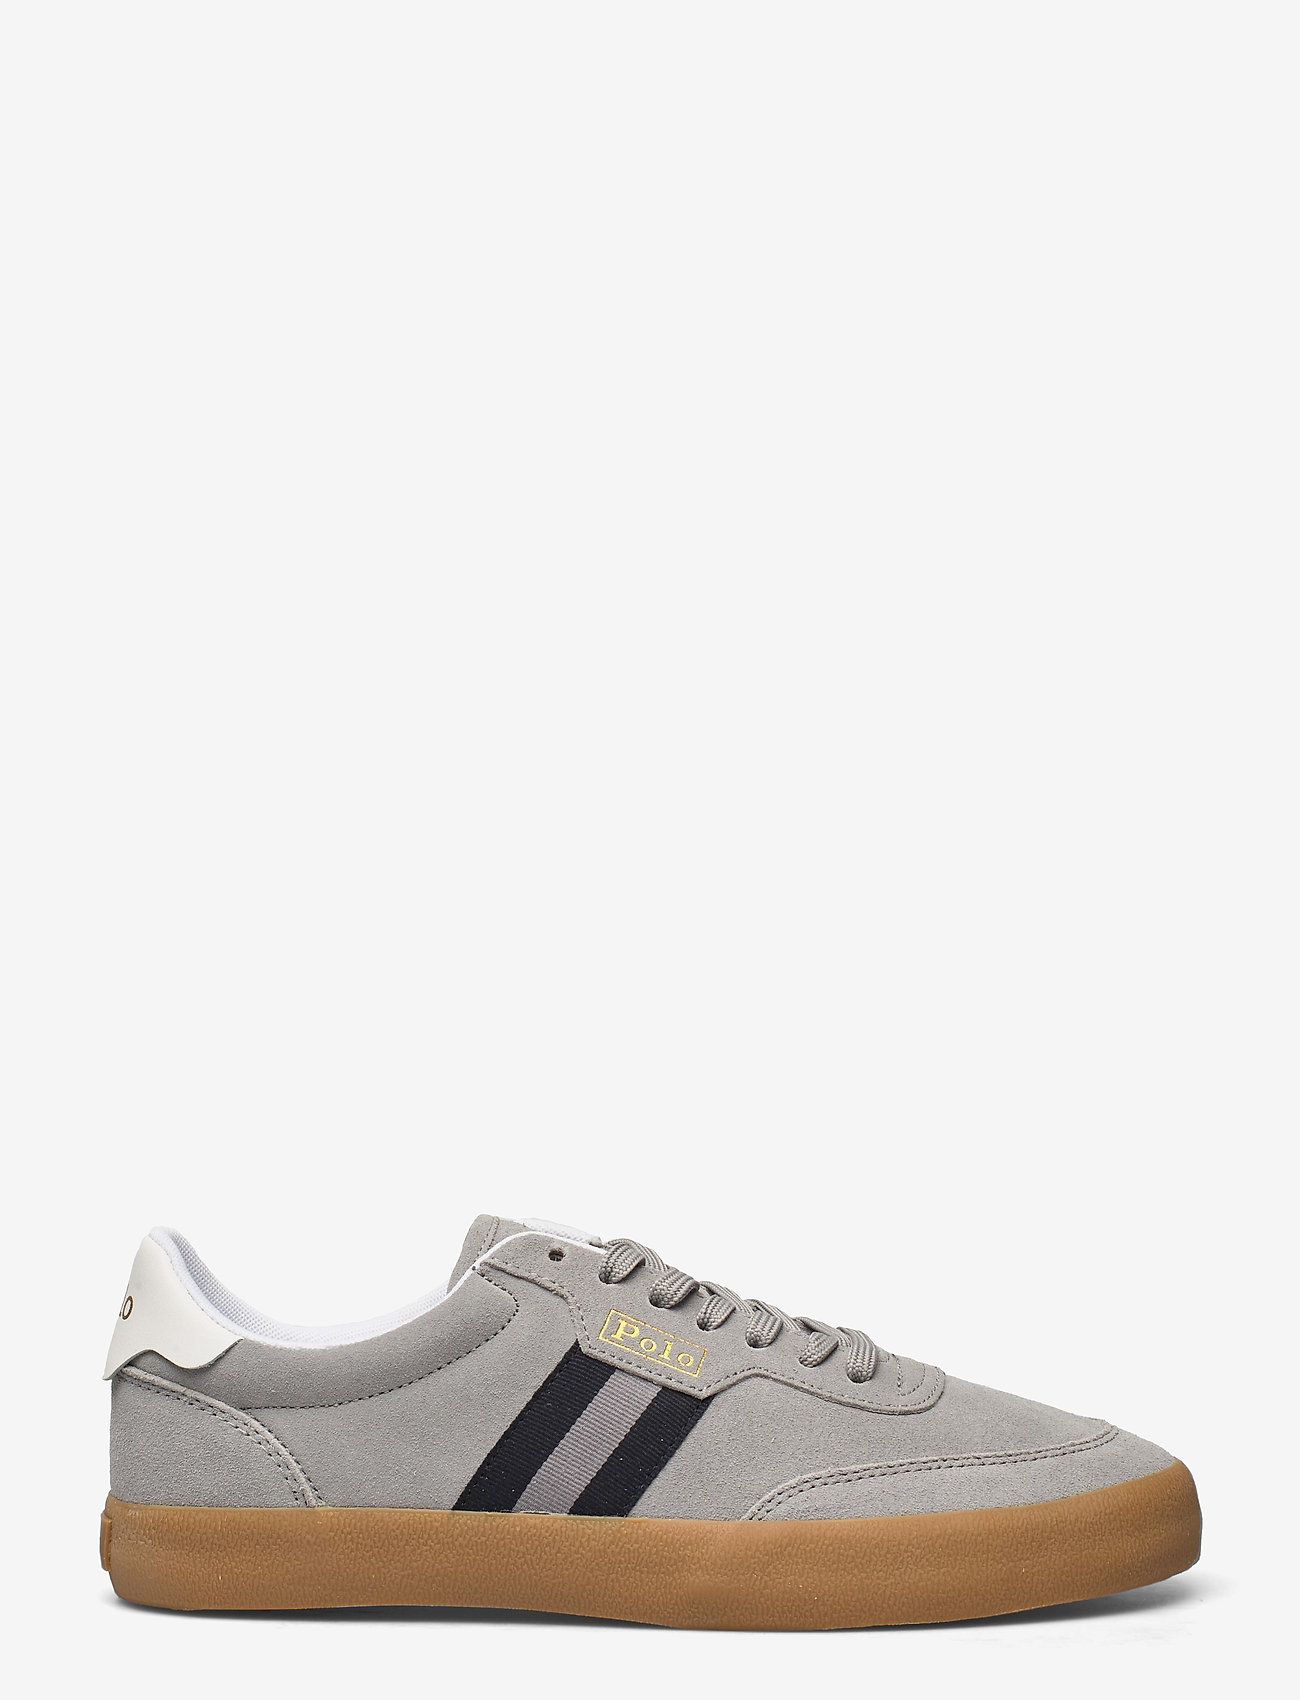 Polo Ralph Lauren - SENIOR SUEDE-CRT VLC-PWNG-SK-VLC - low tops - soft grey - 1